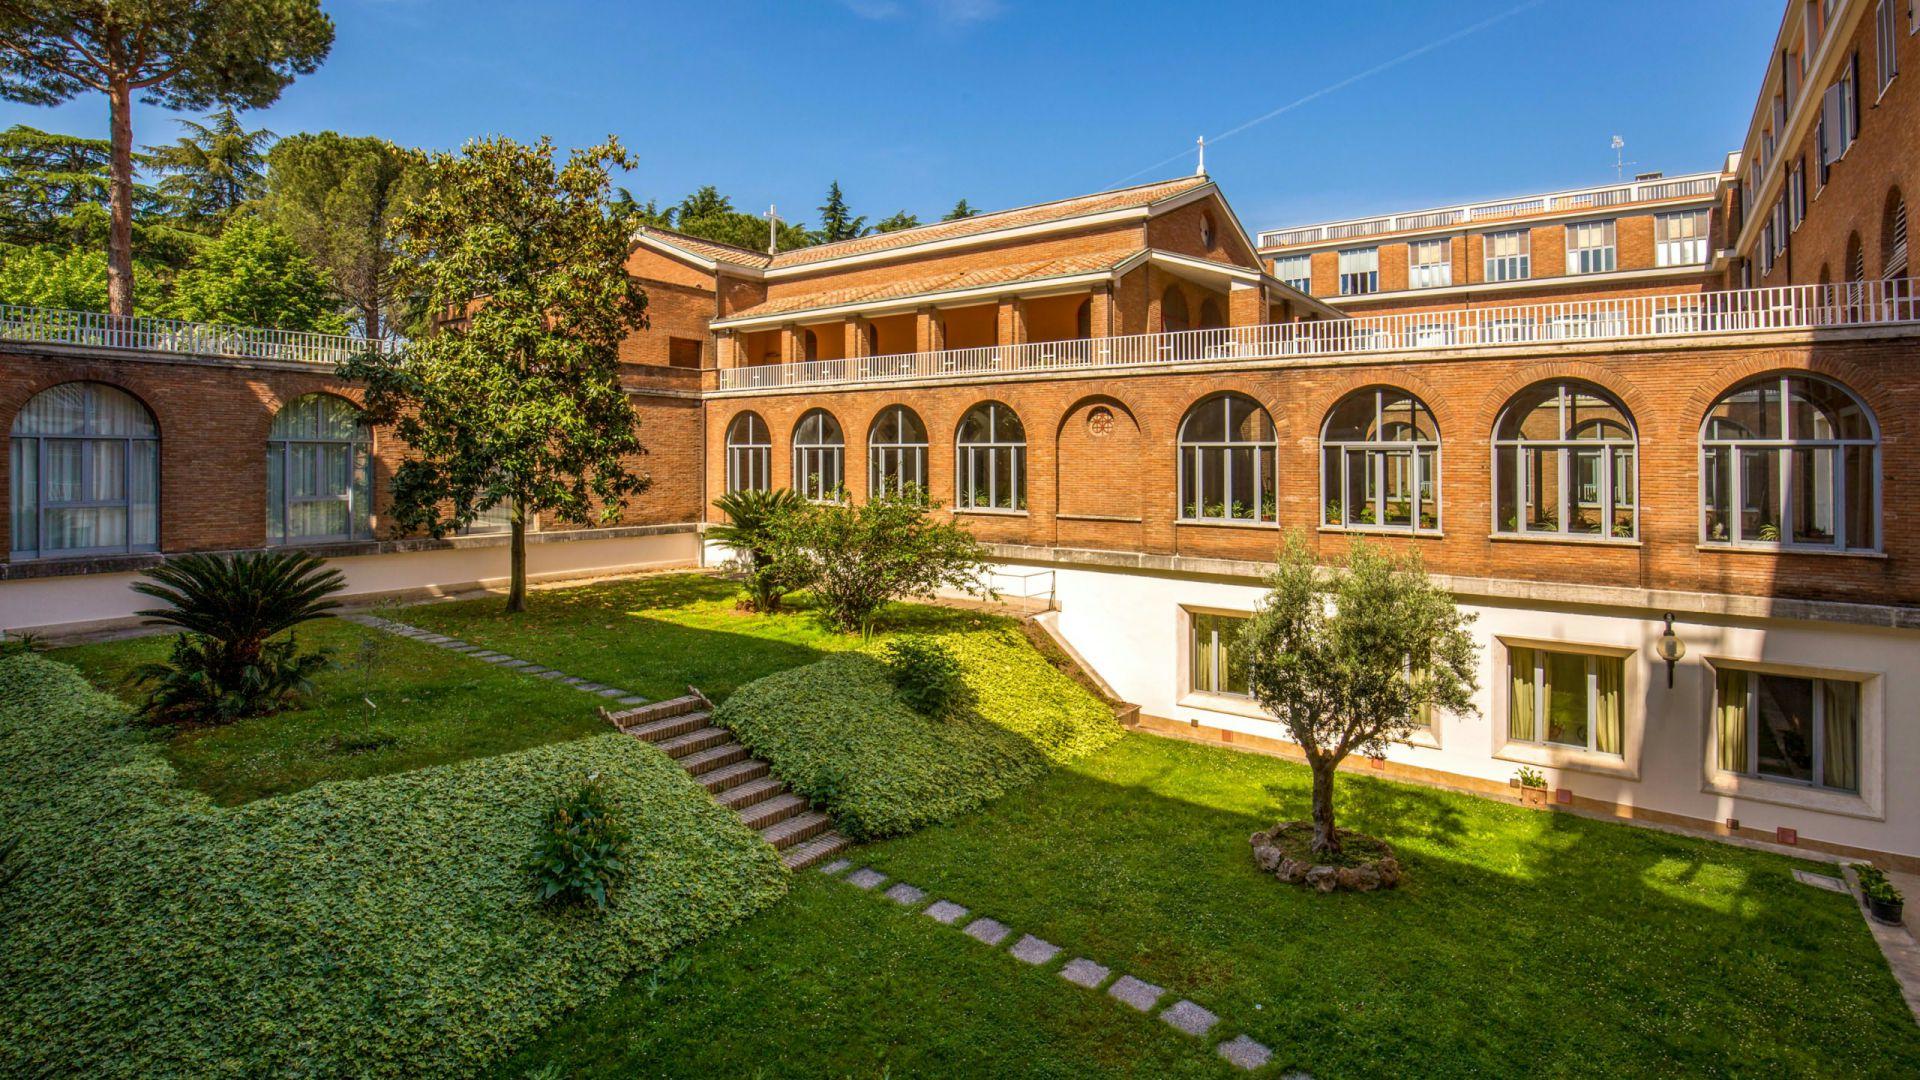 villa-aurelia-hôtel-rome-externe-02